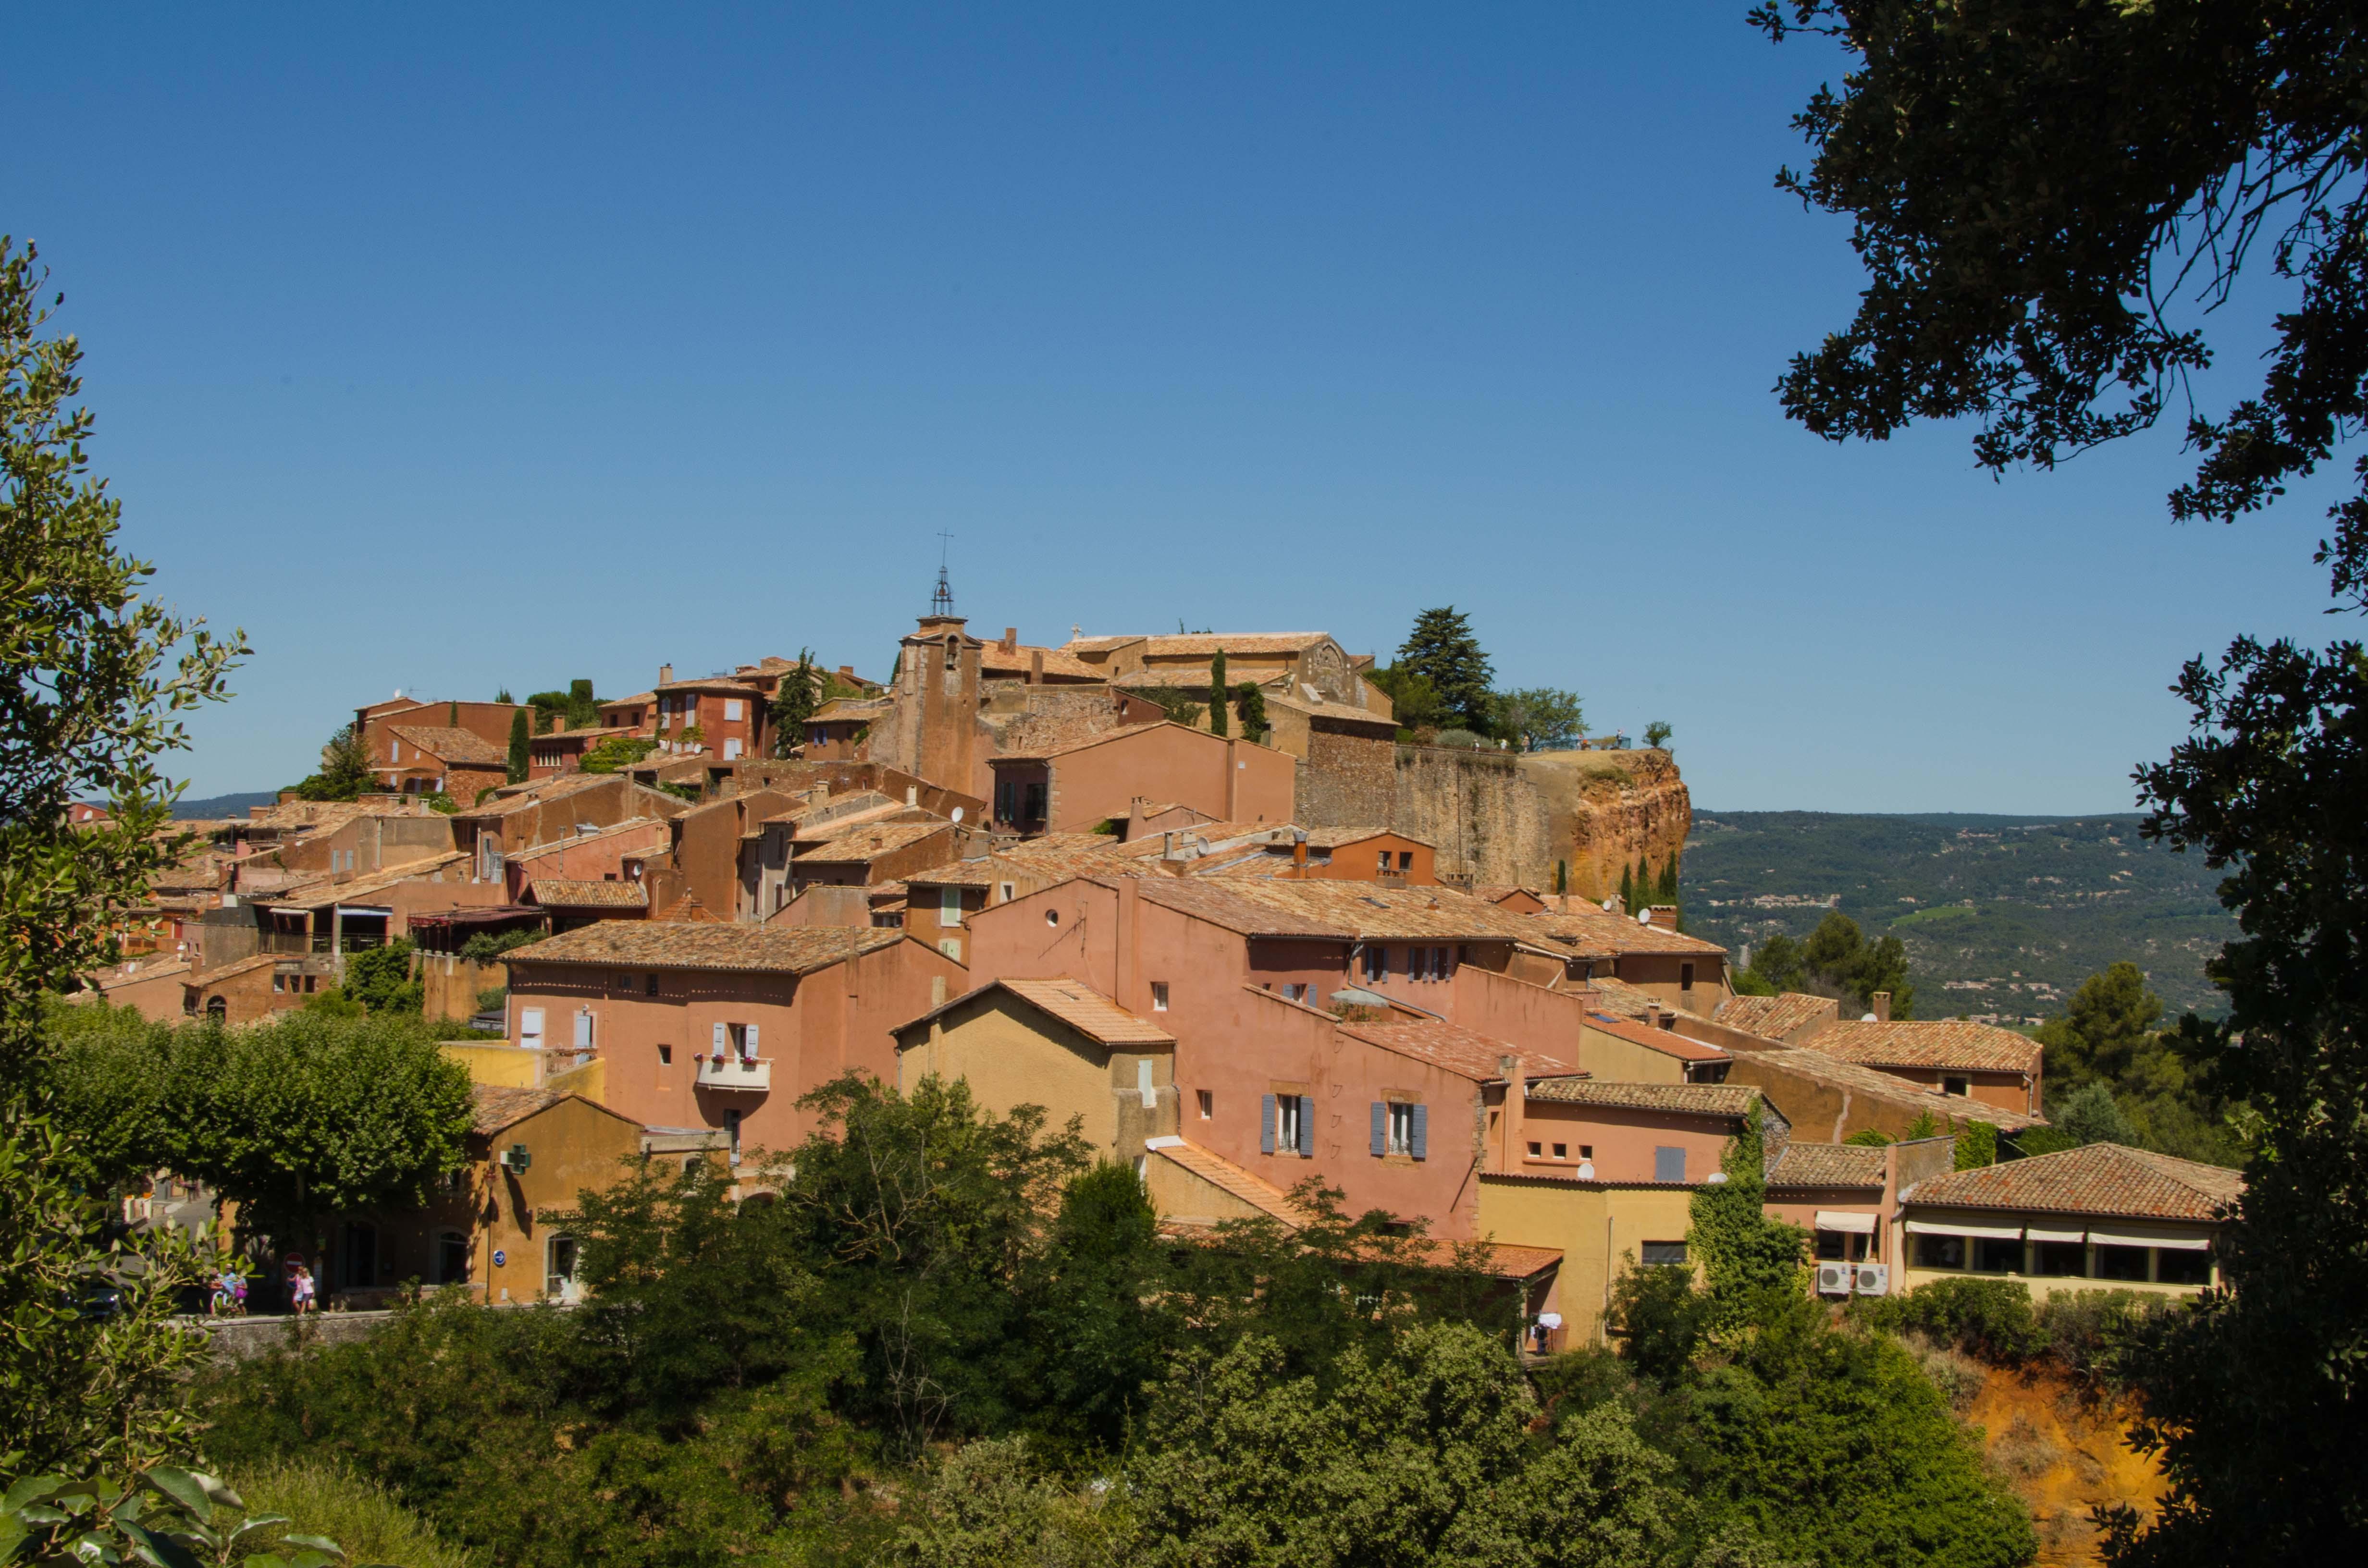 provenza15 Vacanze in Provenza, Camargue e Costa Azzurra